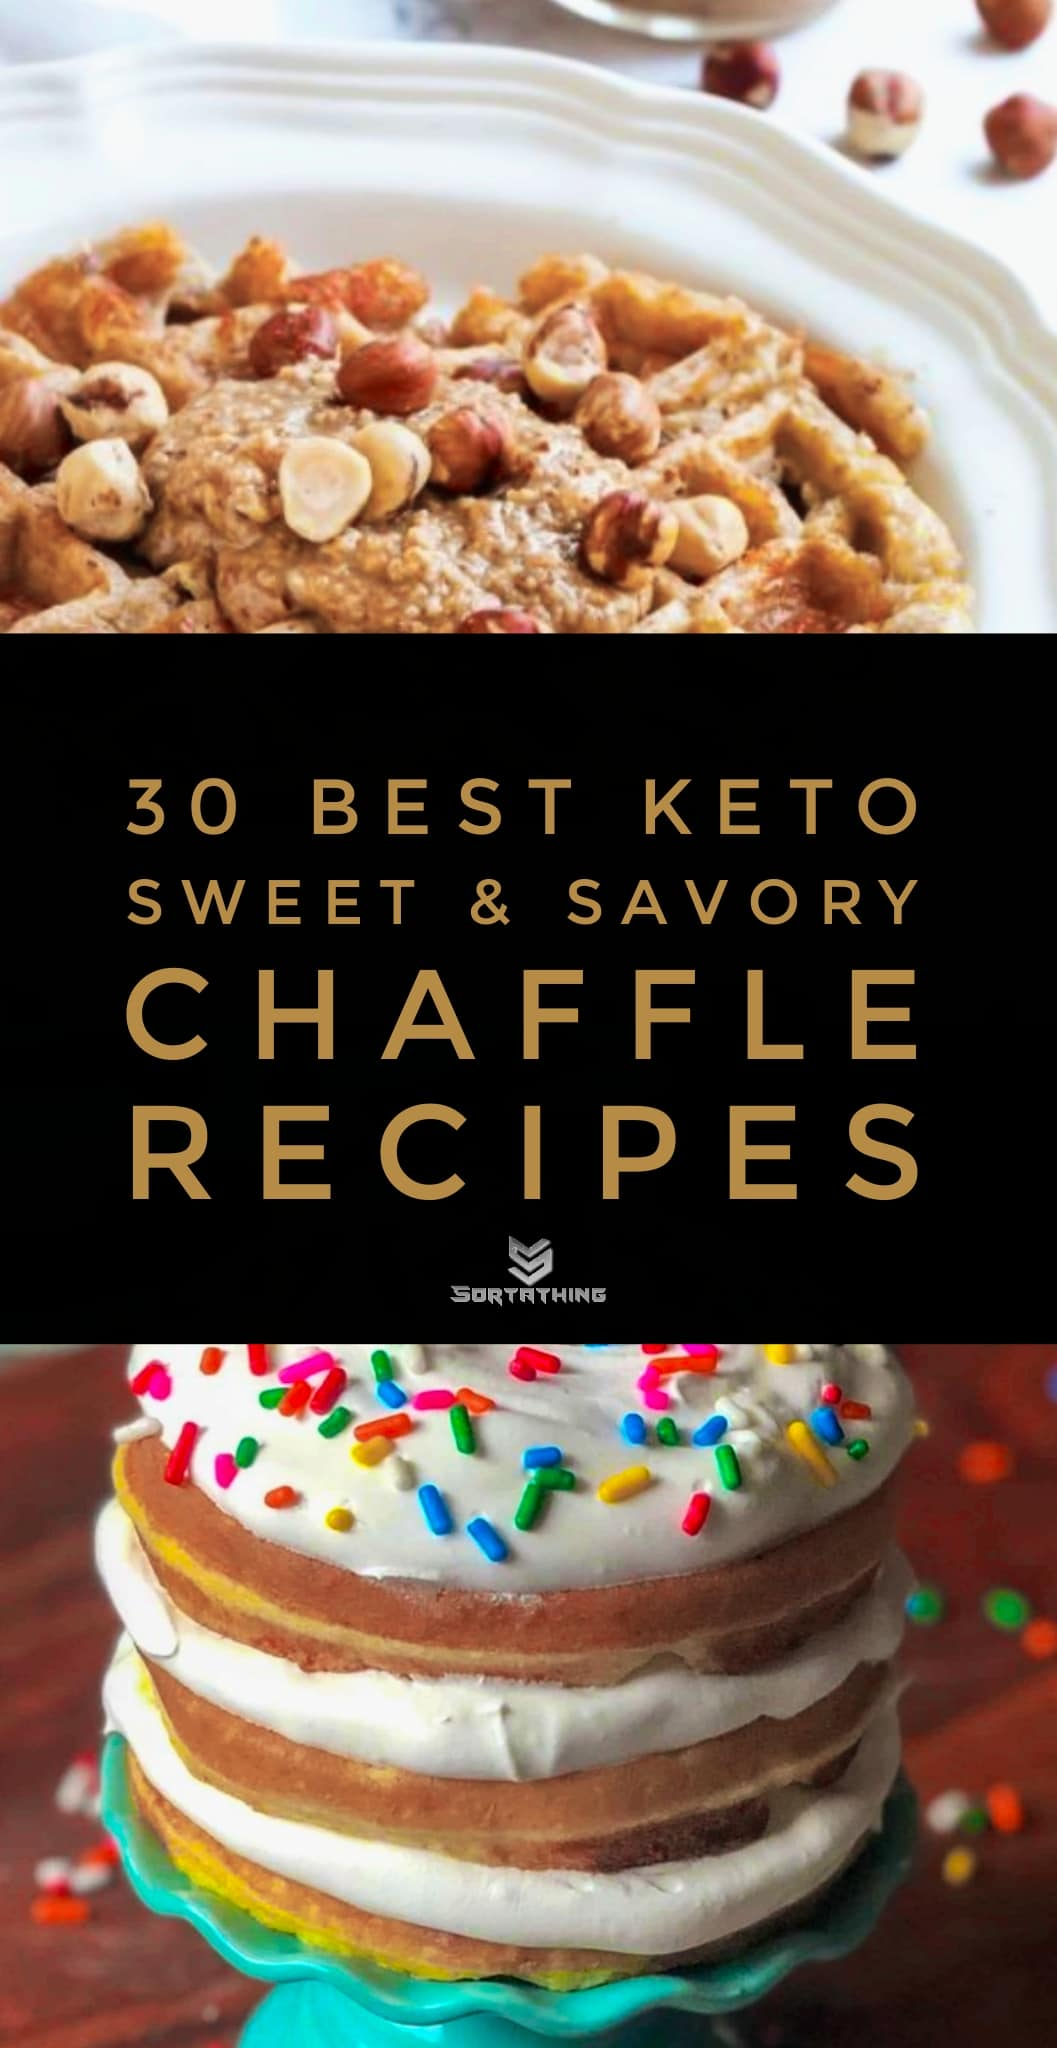 Peanut Butter Chaffle Recipe and Keto Birthday Cake Chaffle Recipe